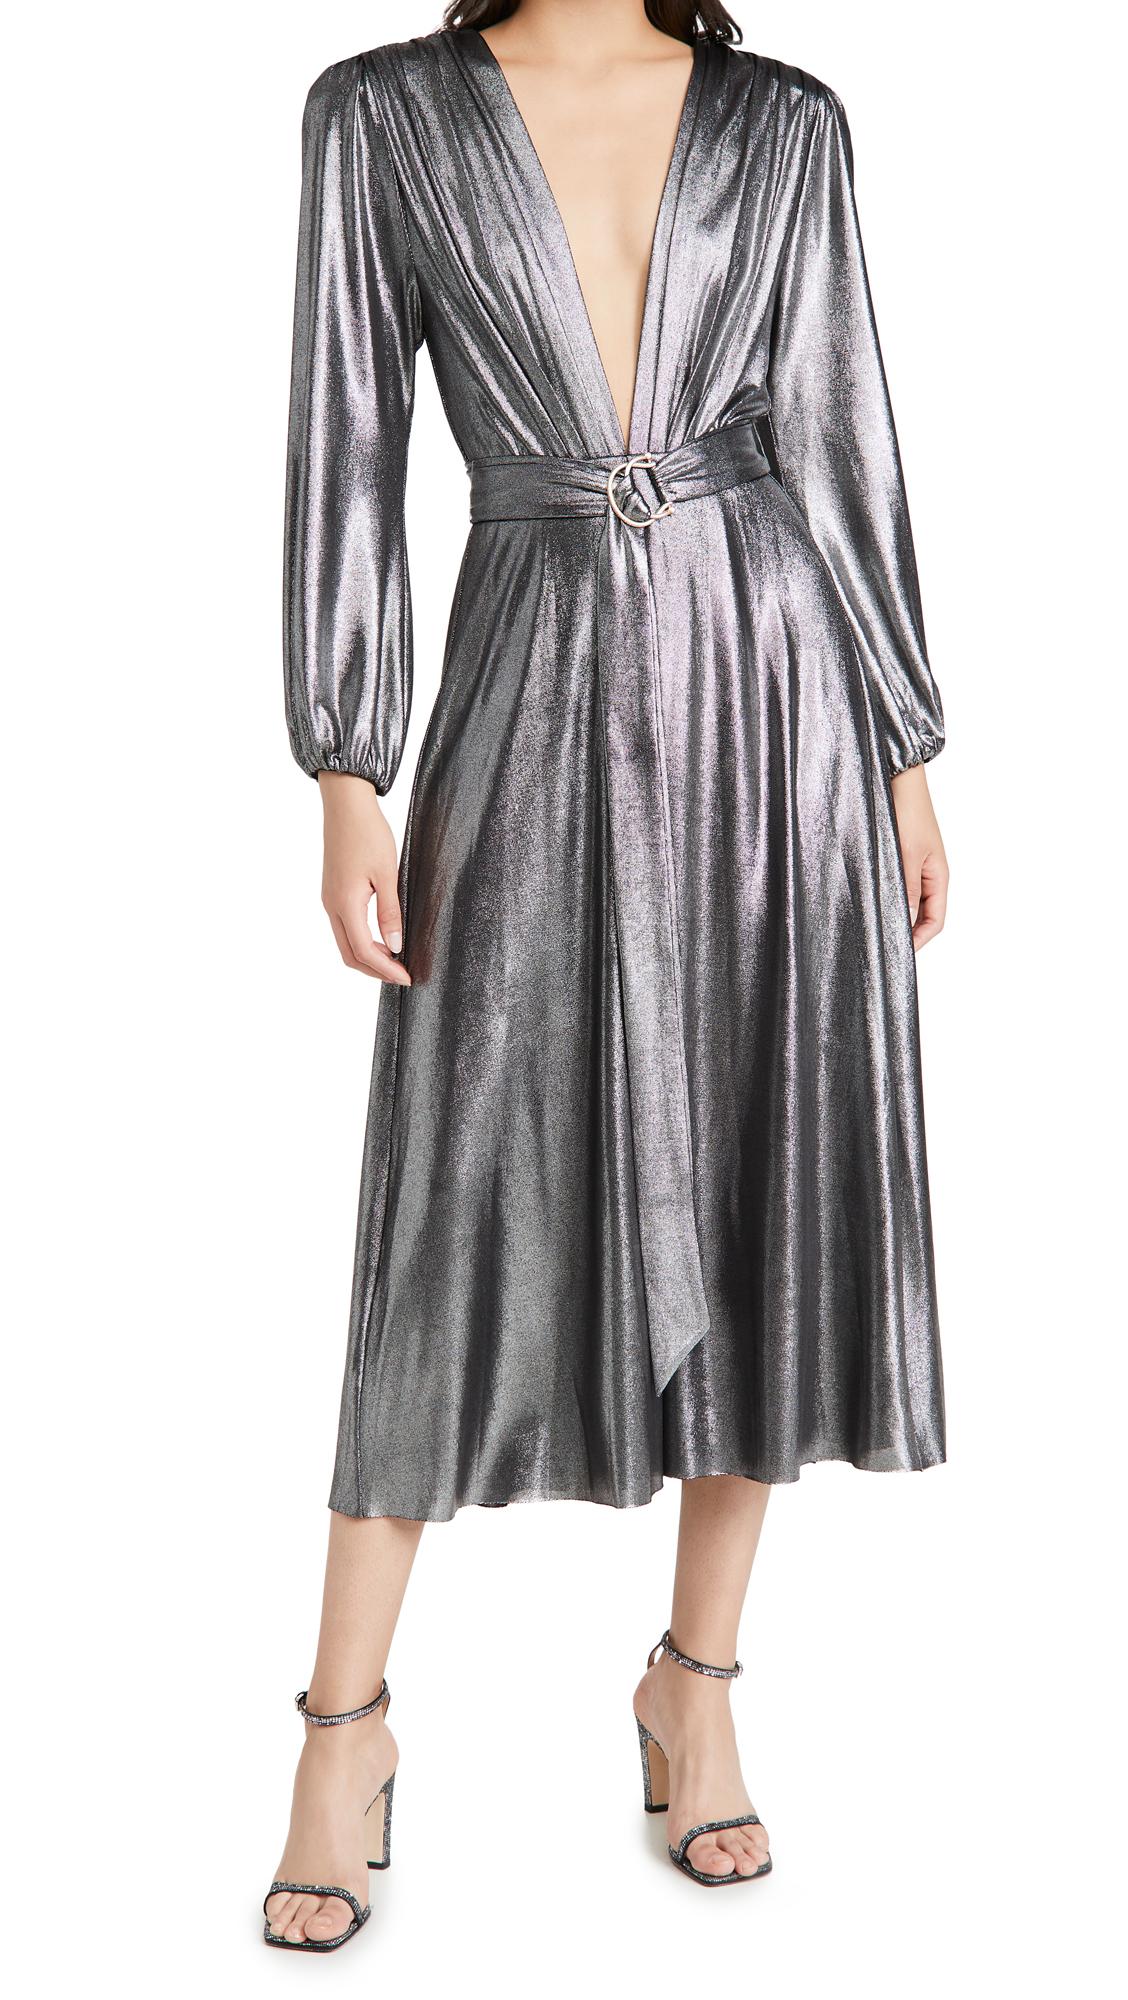 Maria Lucia Hohan Zaila Dress